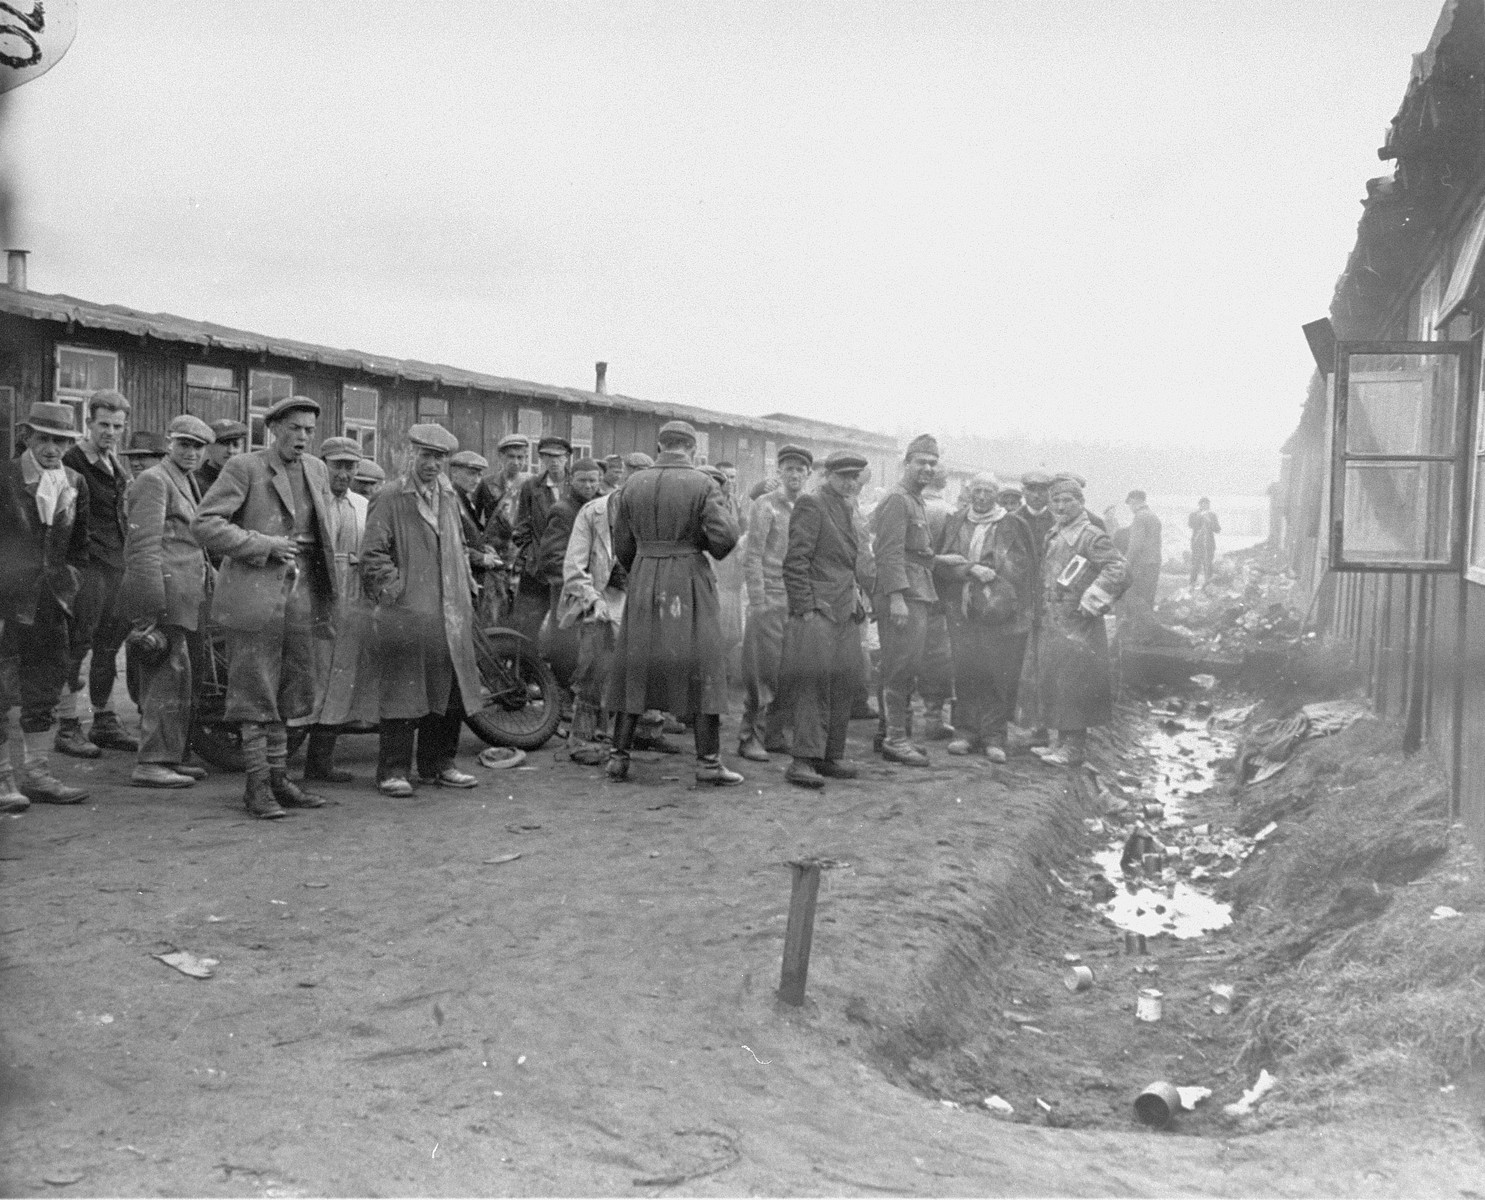 Unidentified soldiers dusting survivors in Bergen Belsen with DDT powder to halt the spread of Typhus.